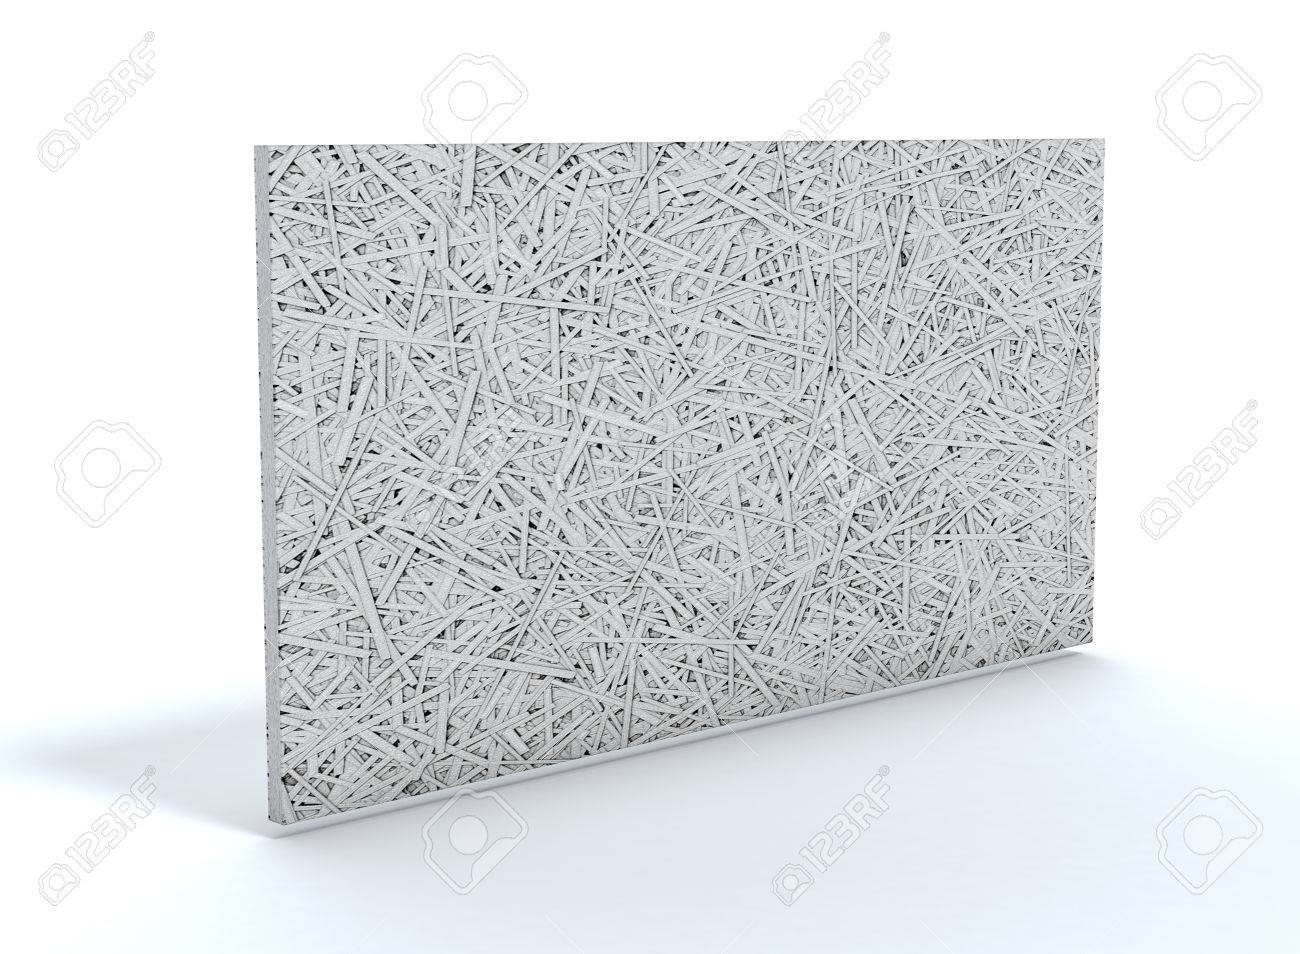 cement bonded wood fiber thermal insulation panel (3d render)